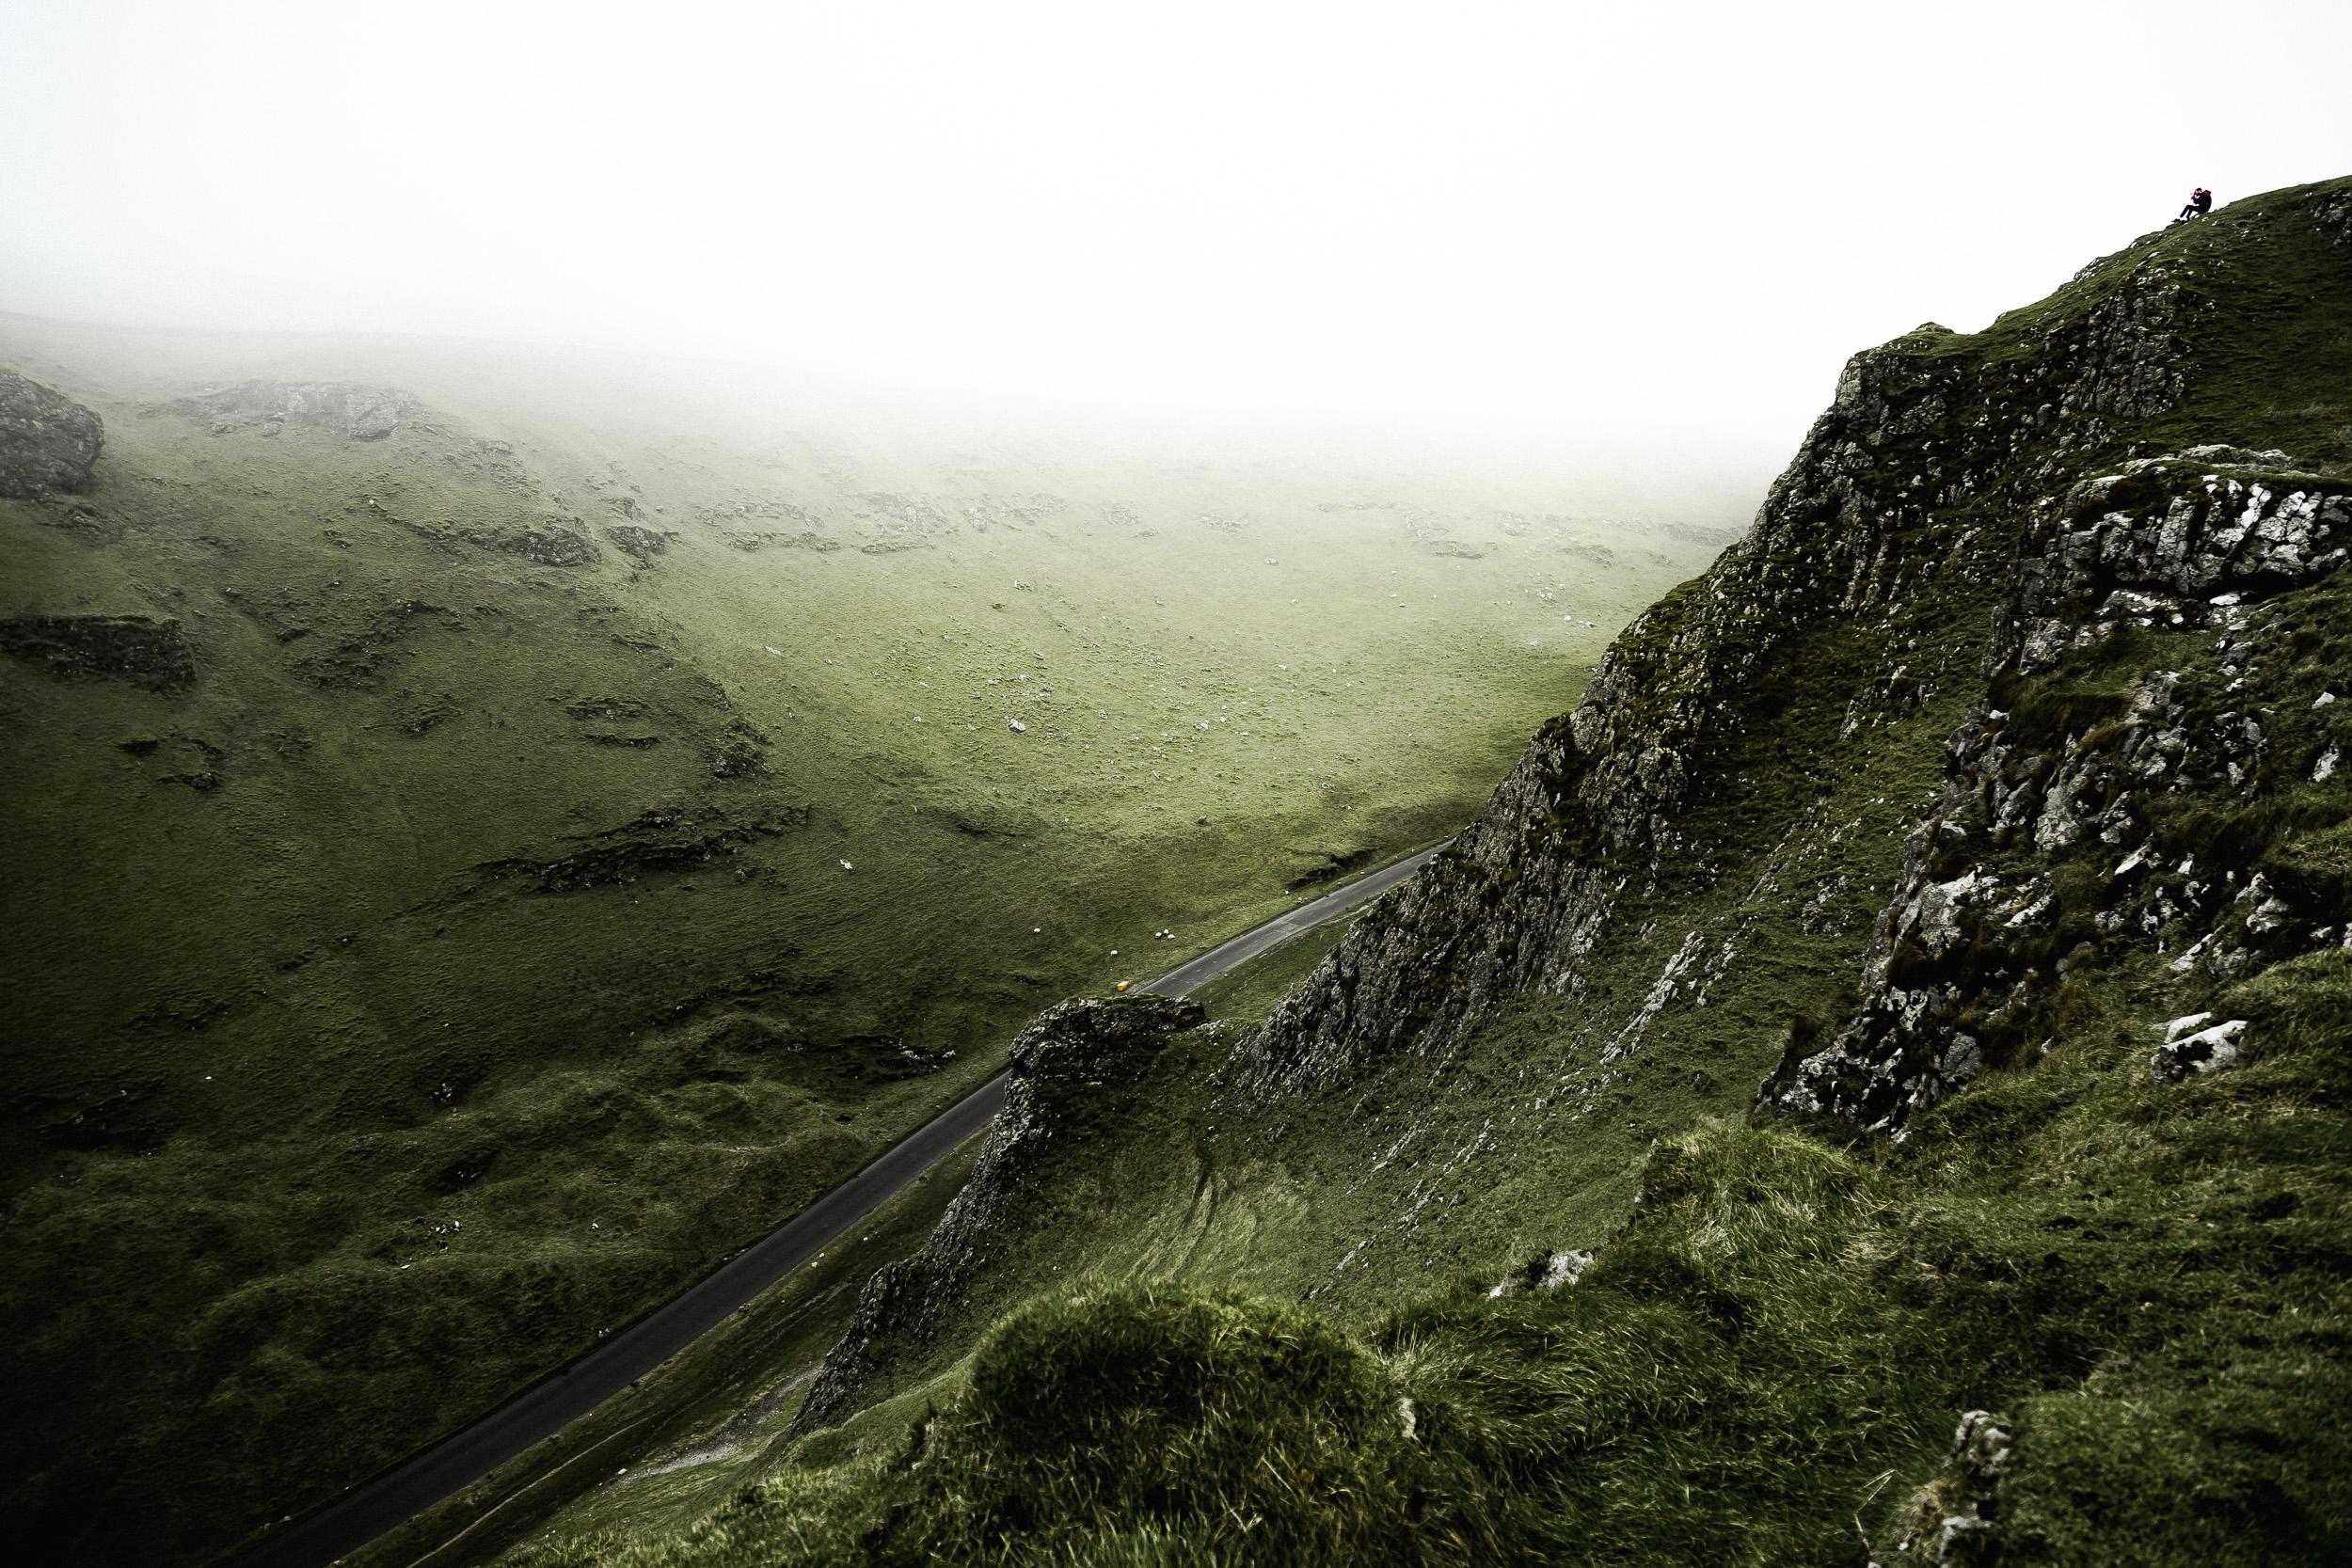 18-winnats-pass-peak-district-hiking-anna-elina-lahti-photographer.jpg